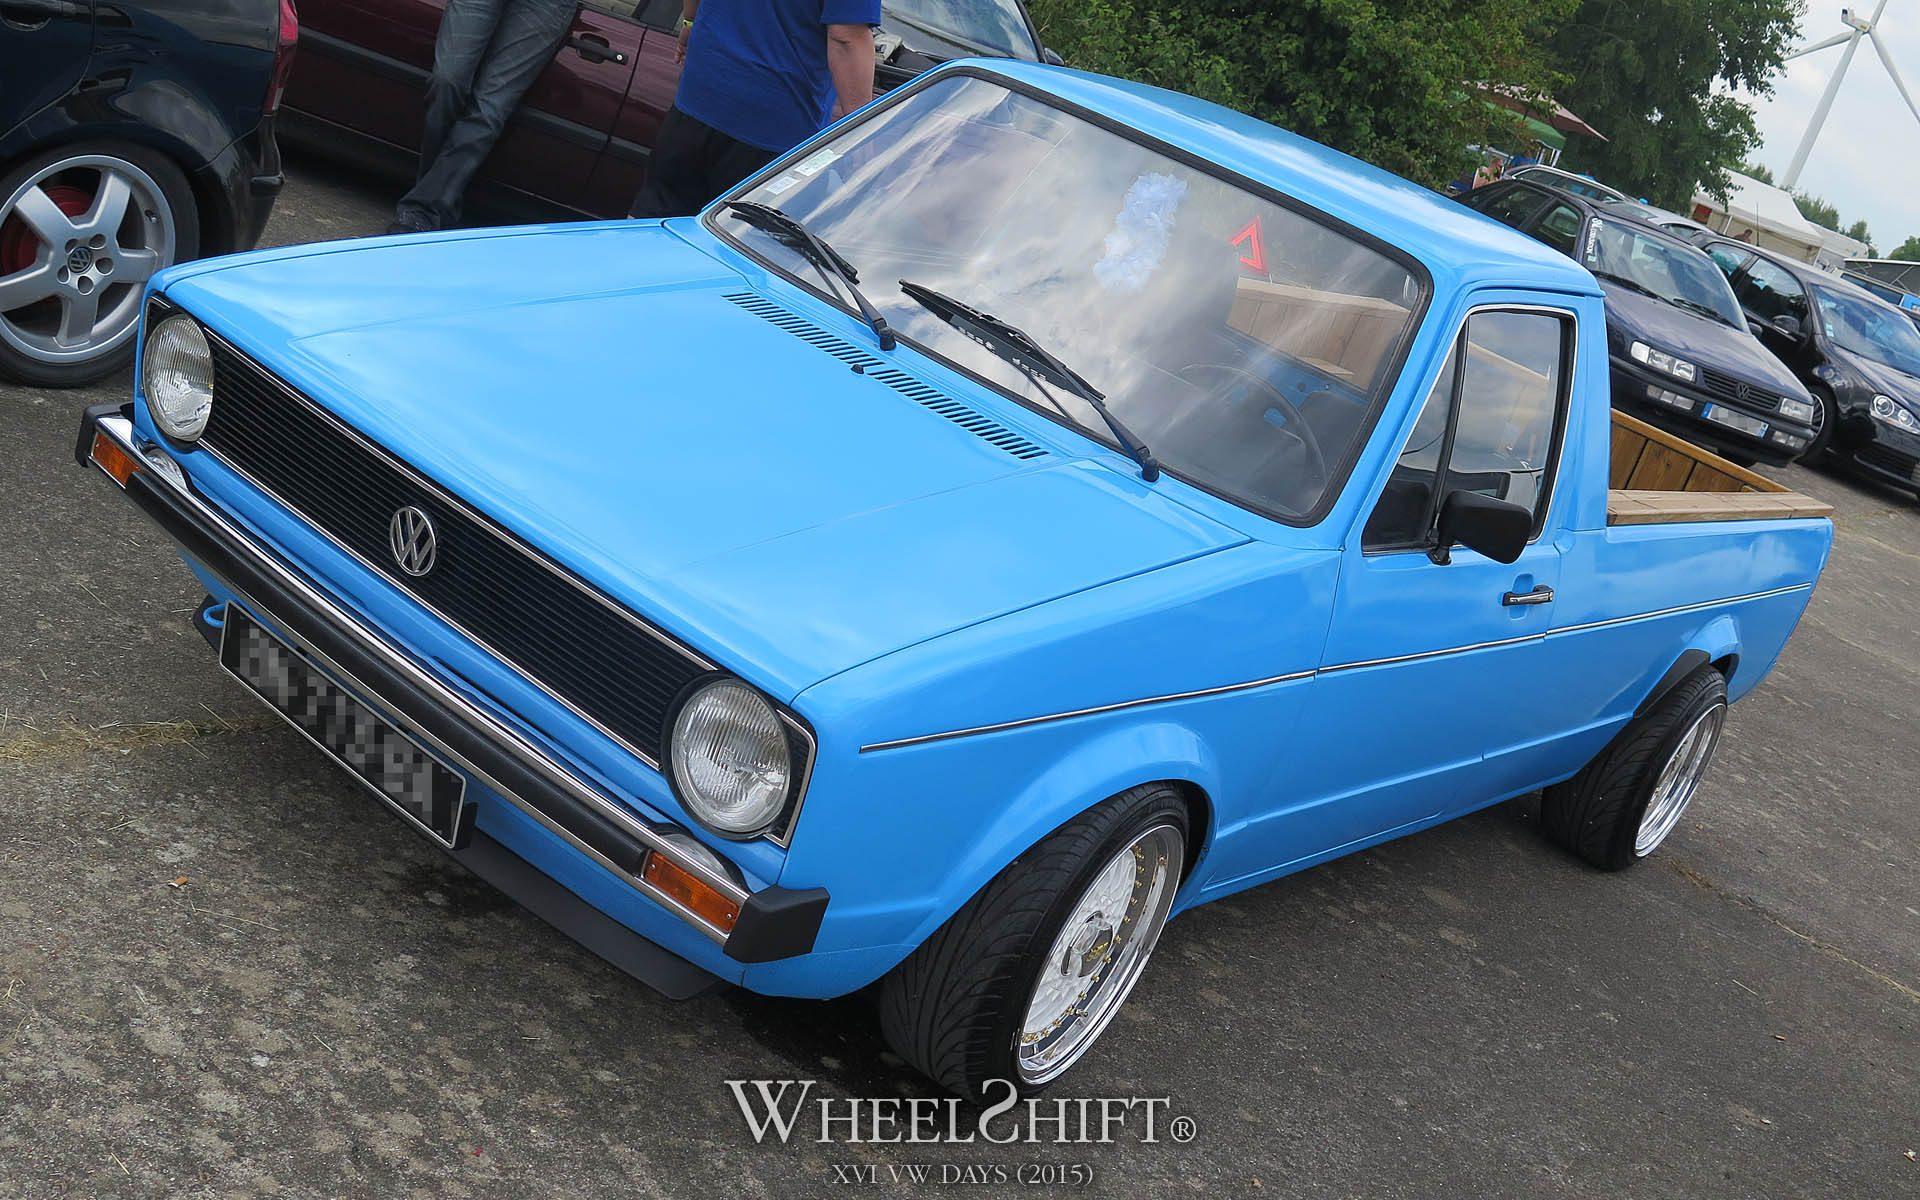 XVI VW Days (2015)